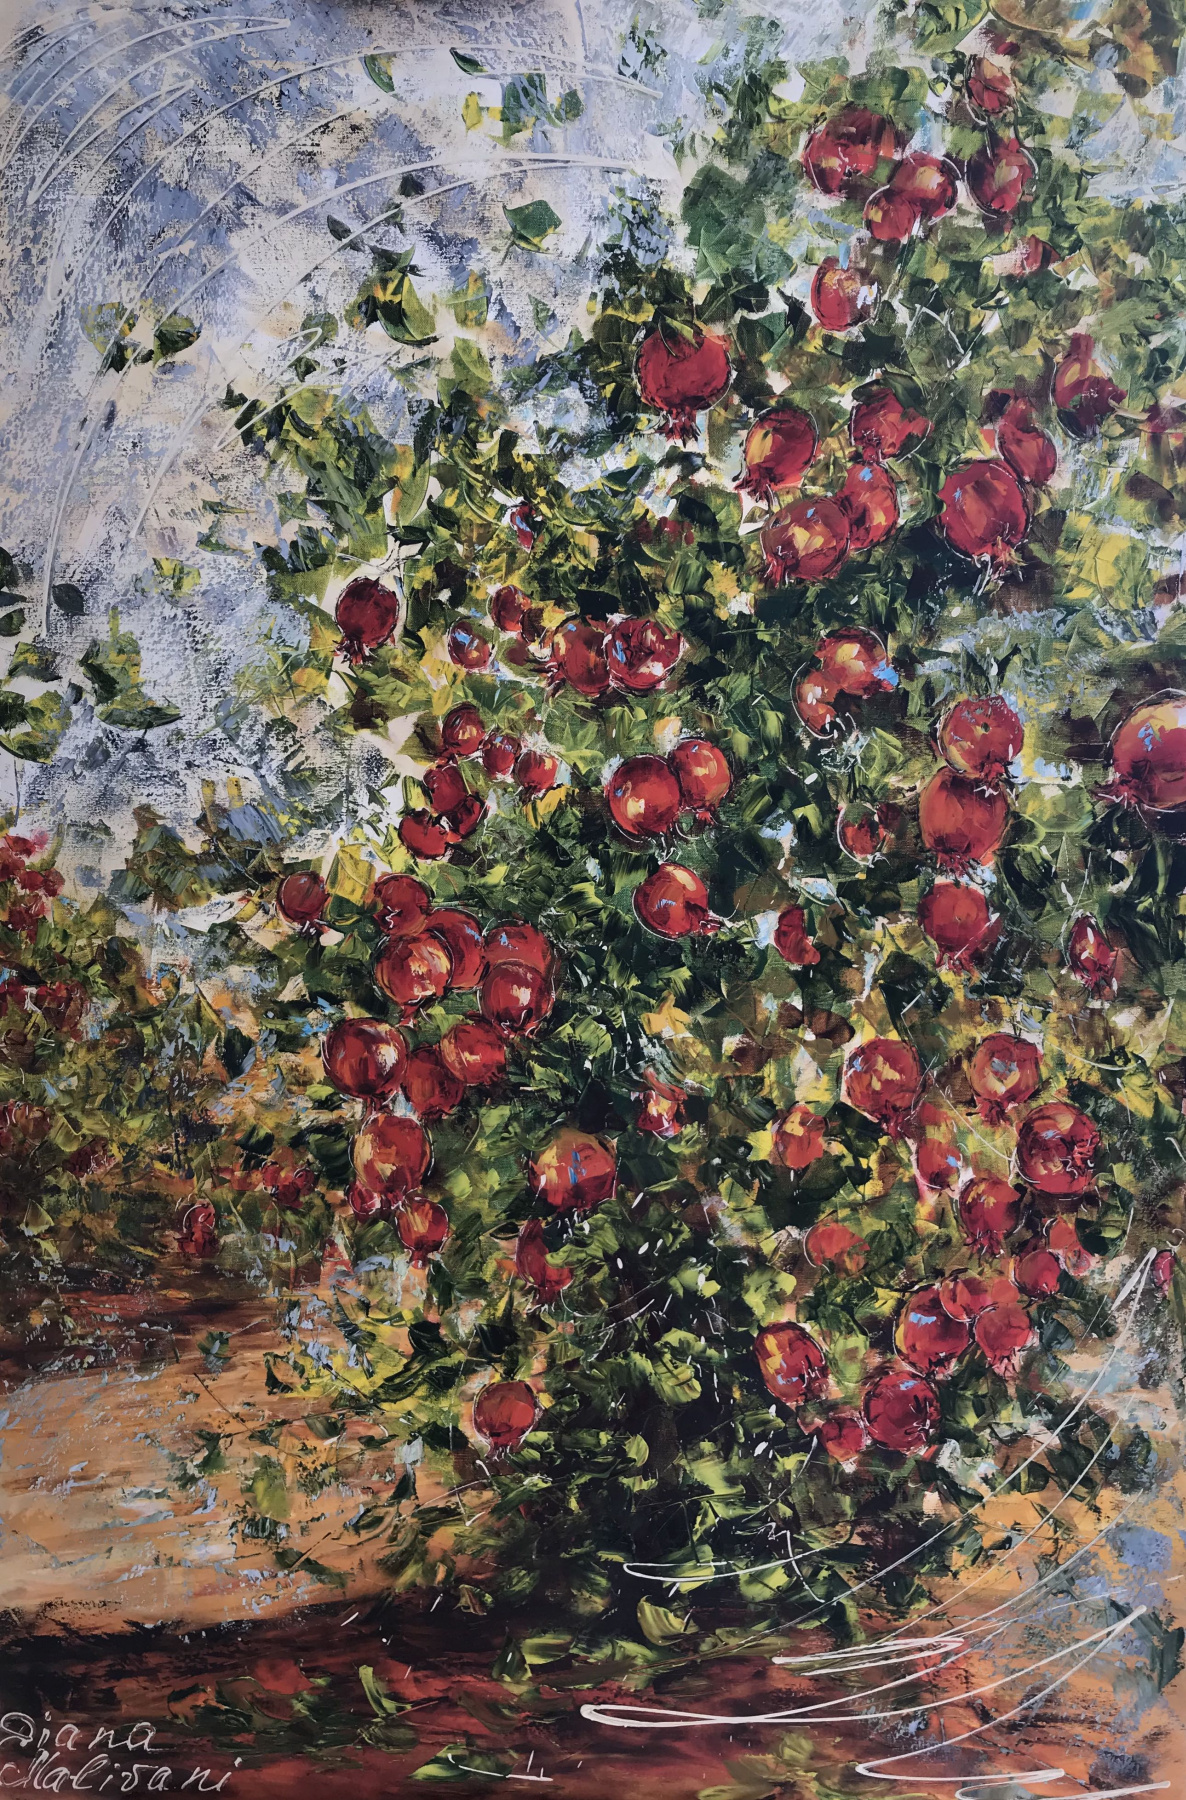 Диана Владимировна Маливани. Pomegranate Tree